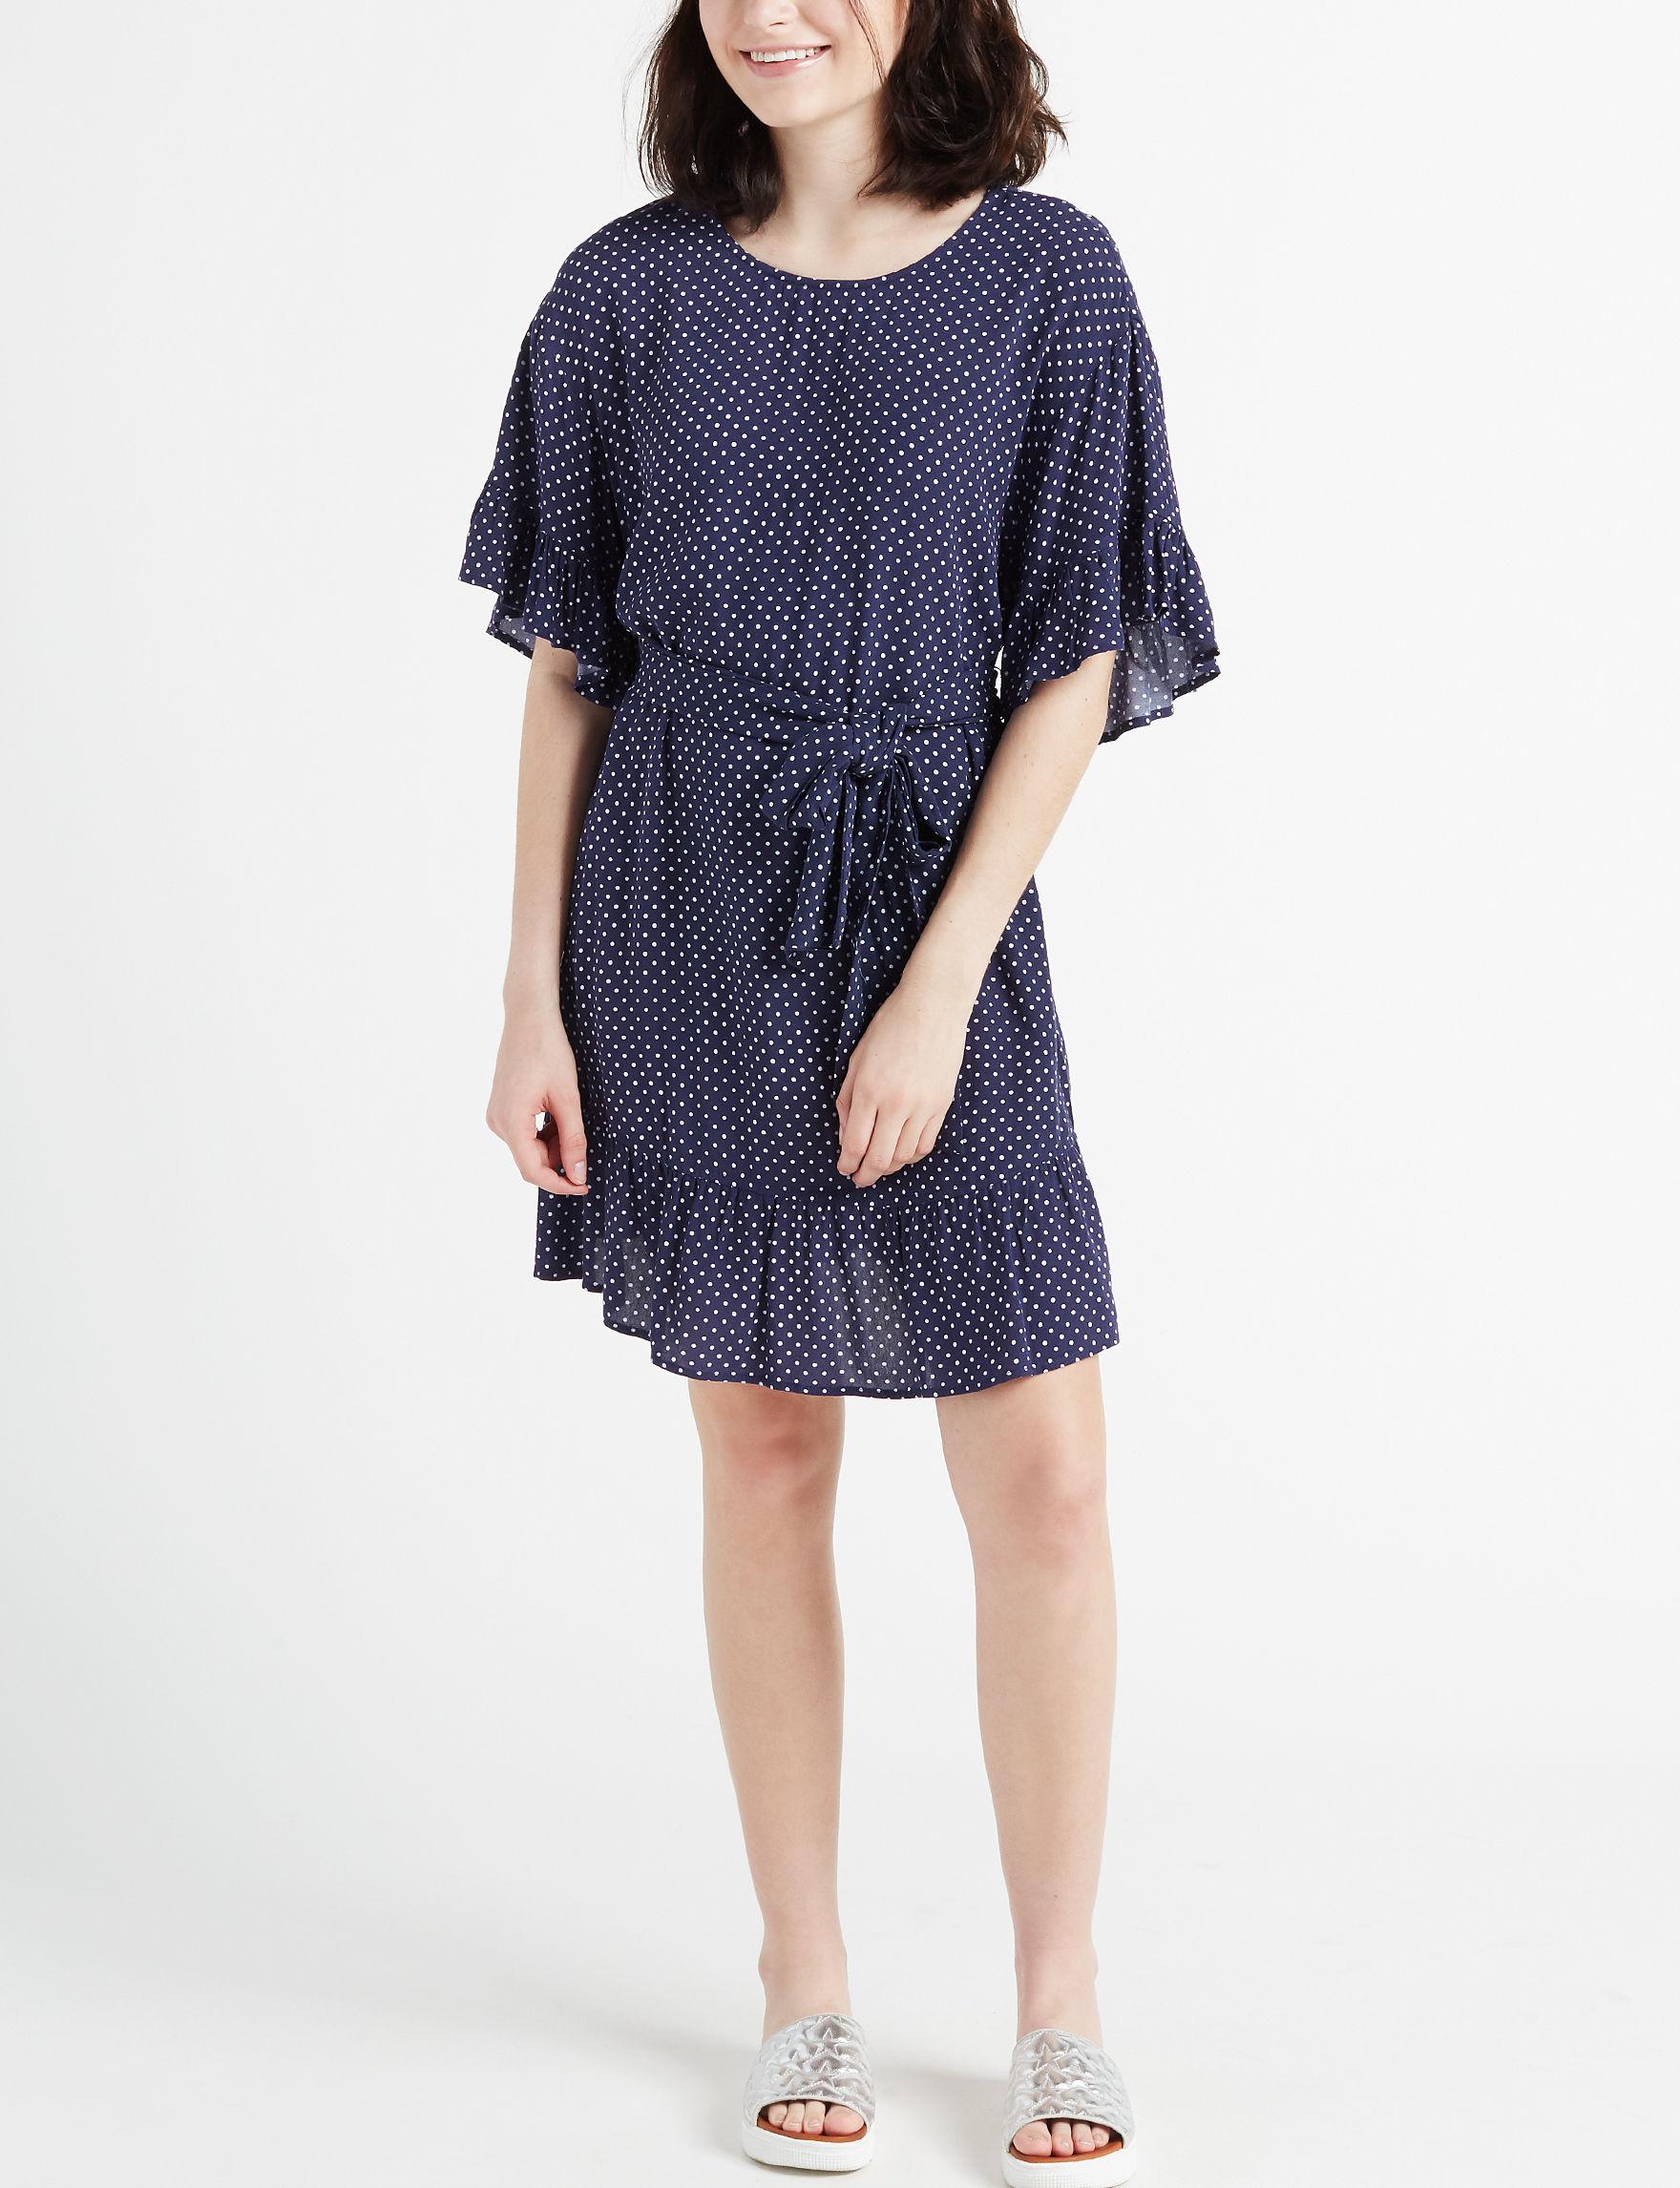 Trixxi Navy / White Everyday & Casual Shift Dresses